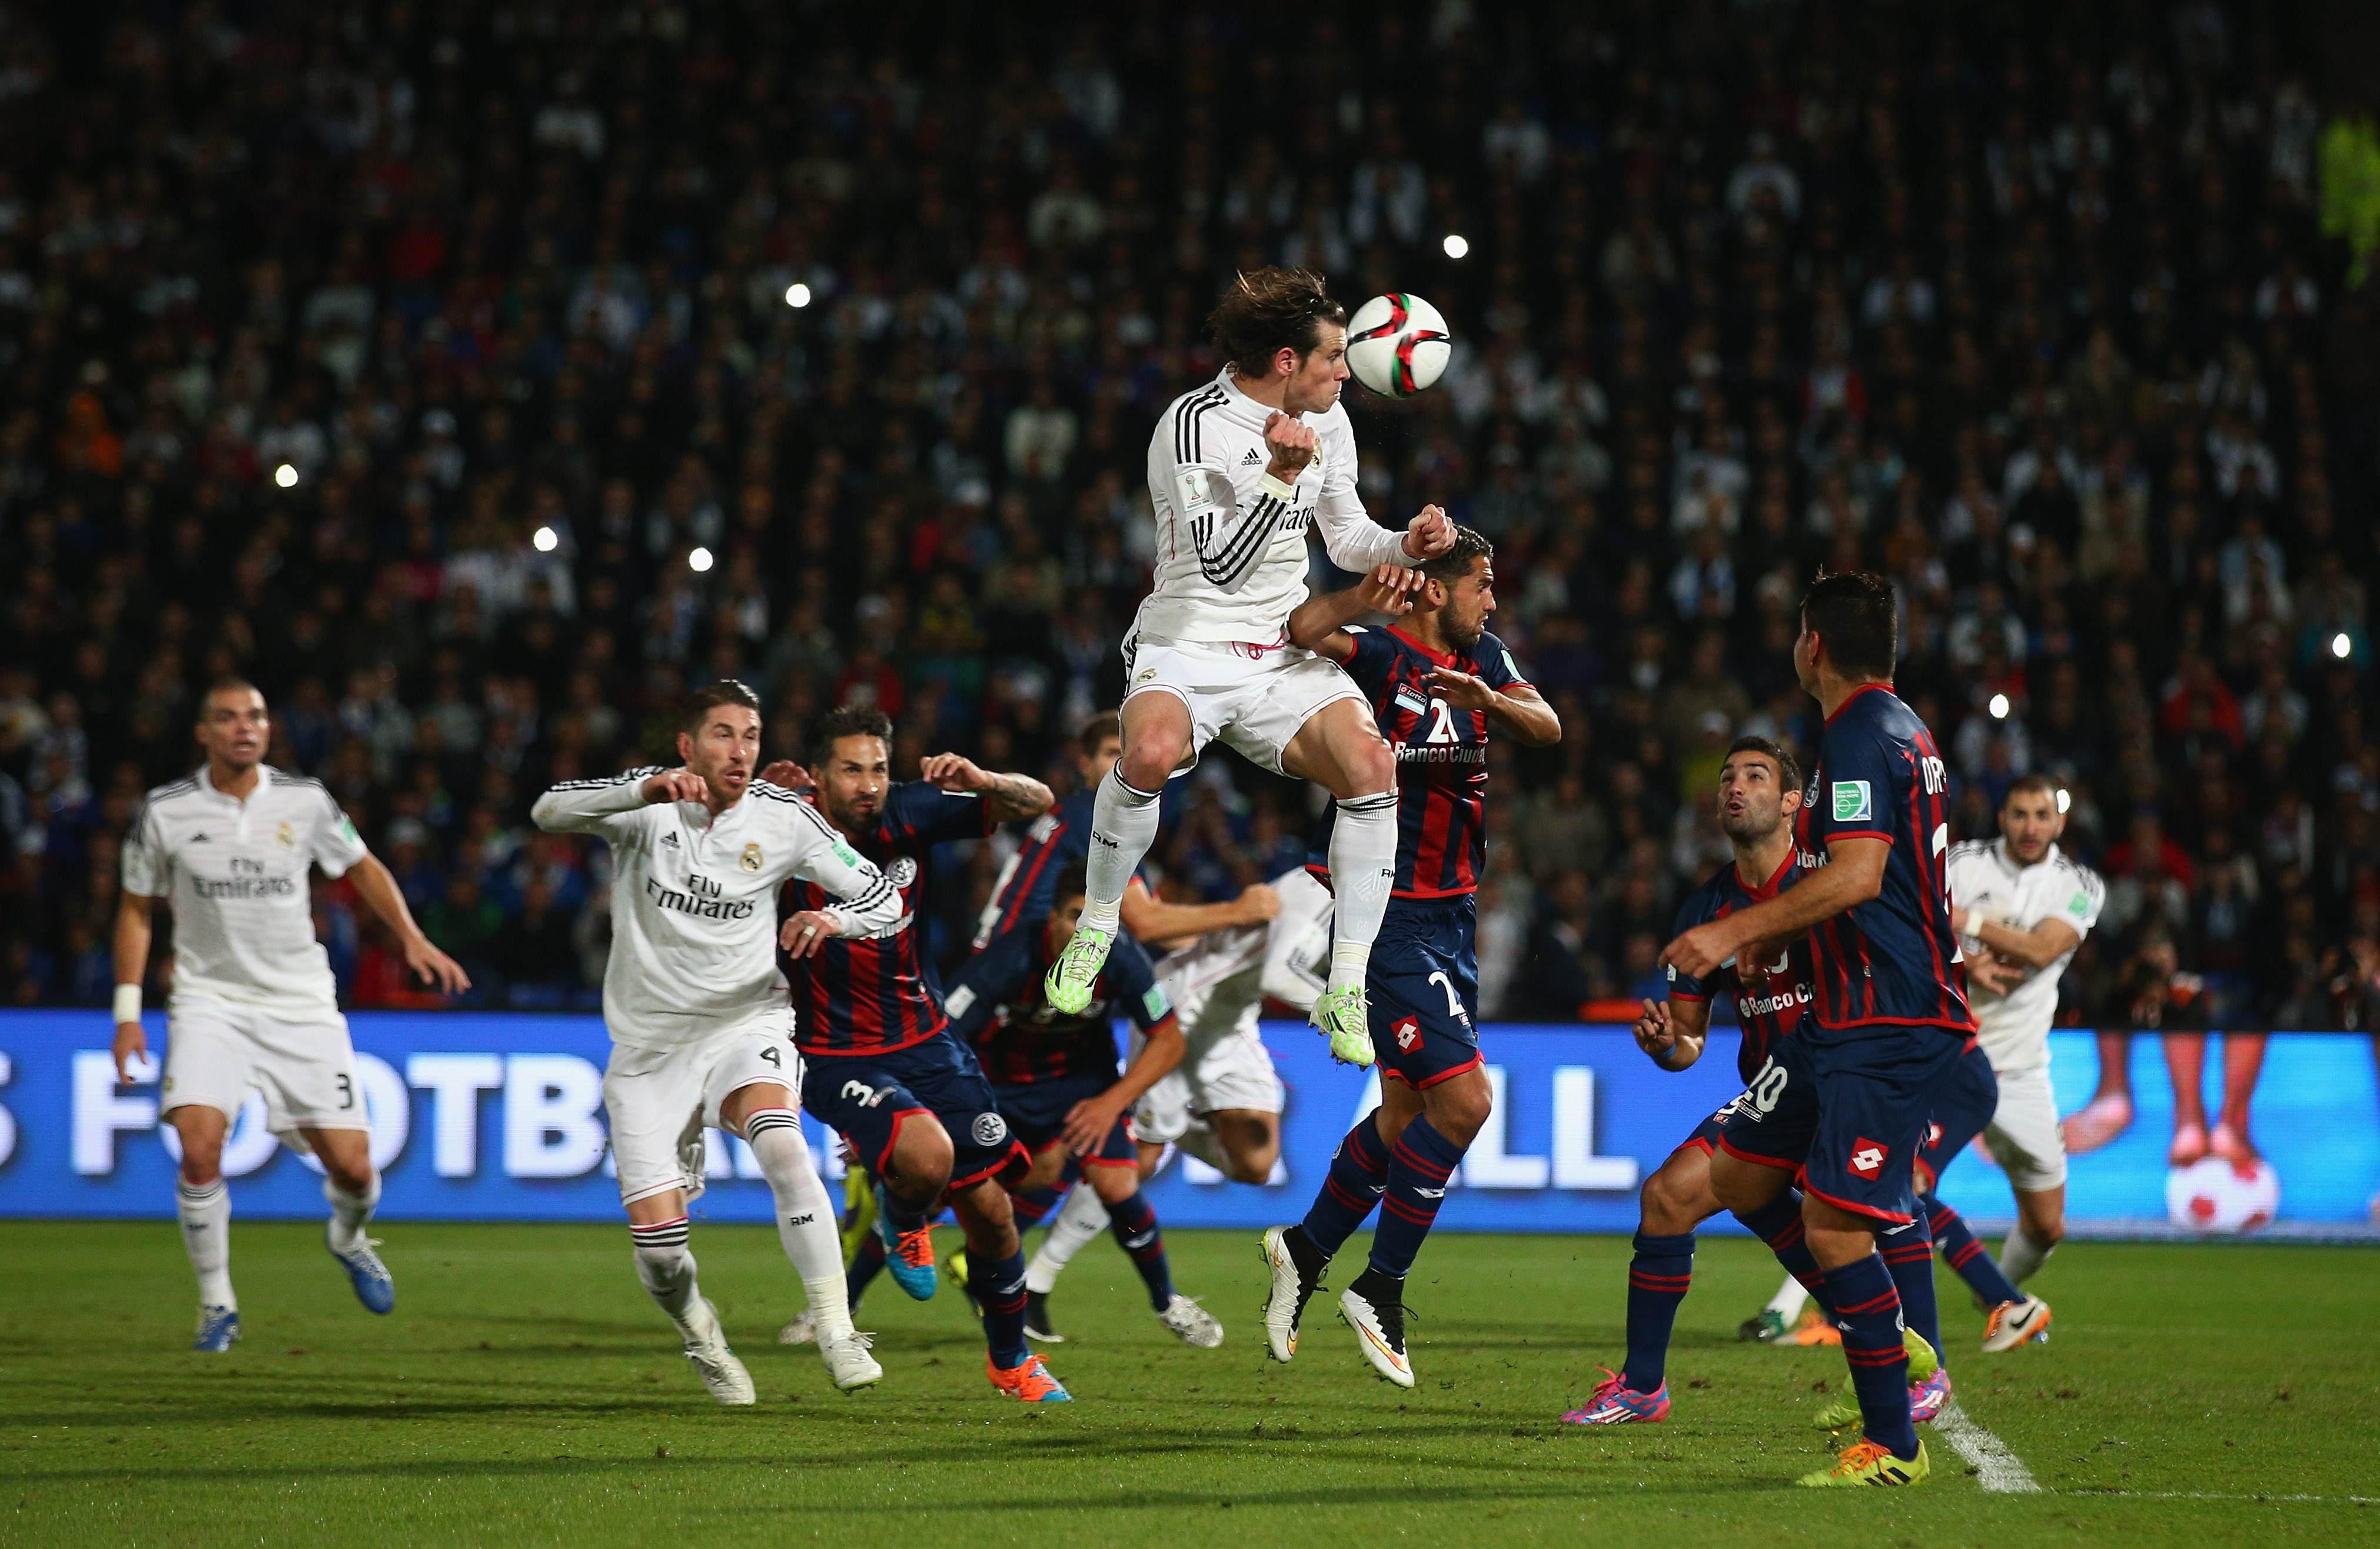 real madrid 2   0 san lorenzo fifa club world cup 2014